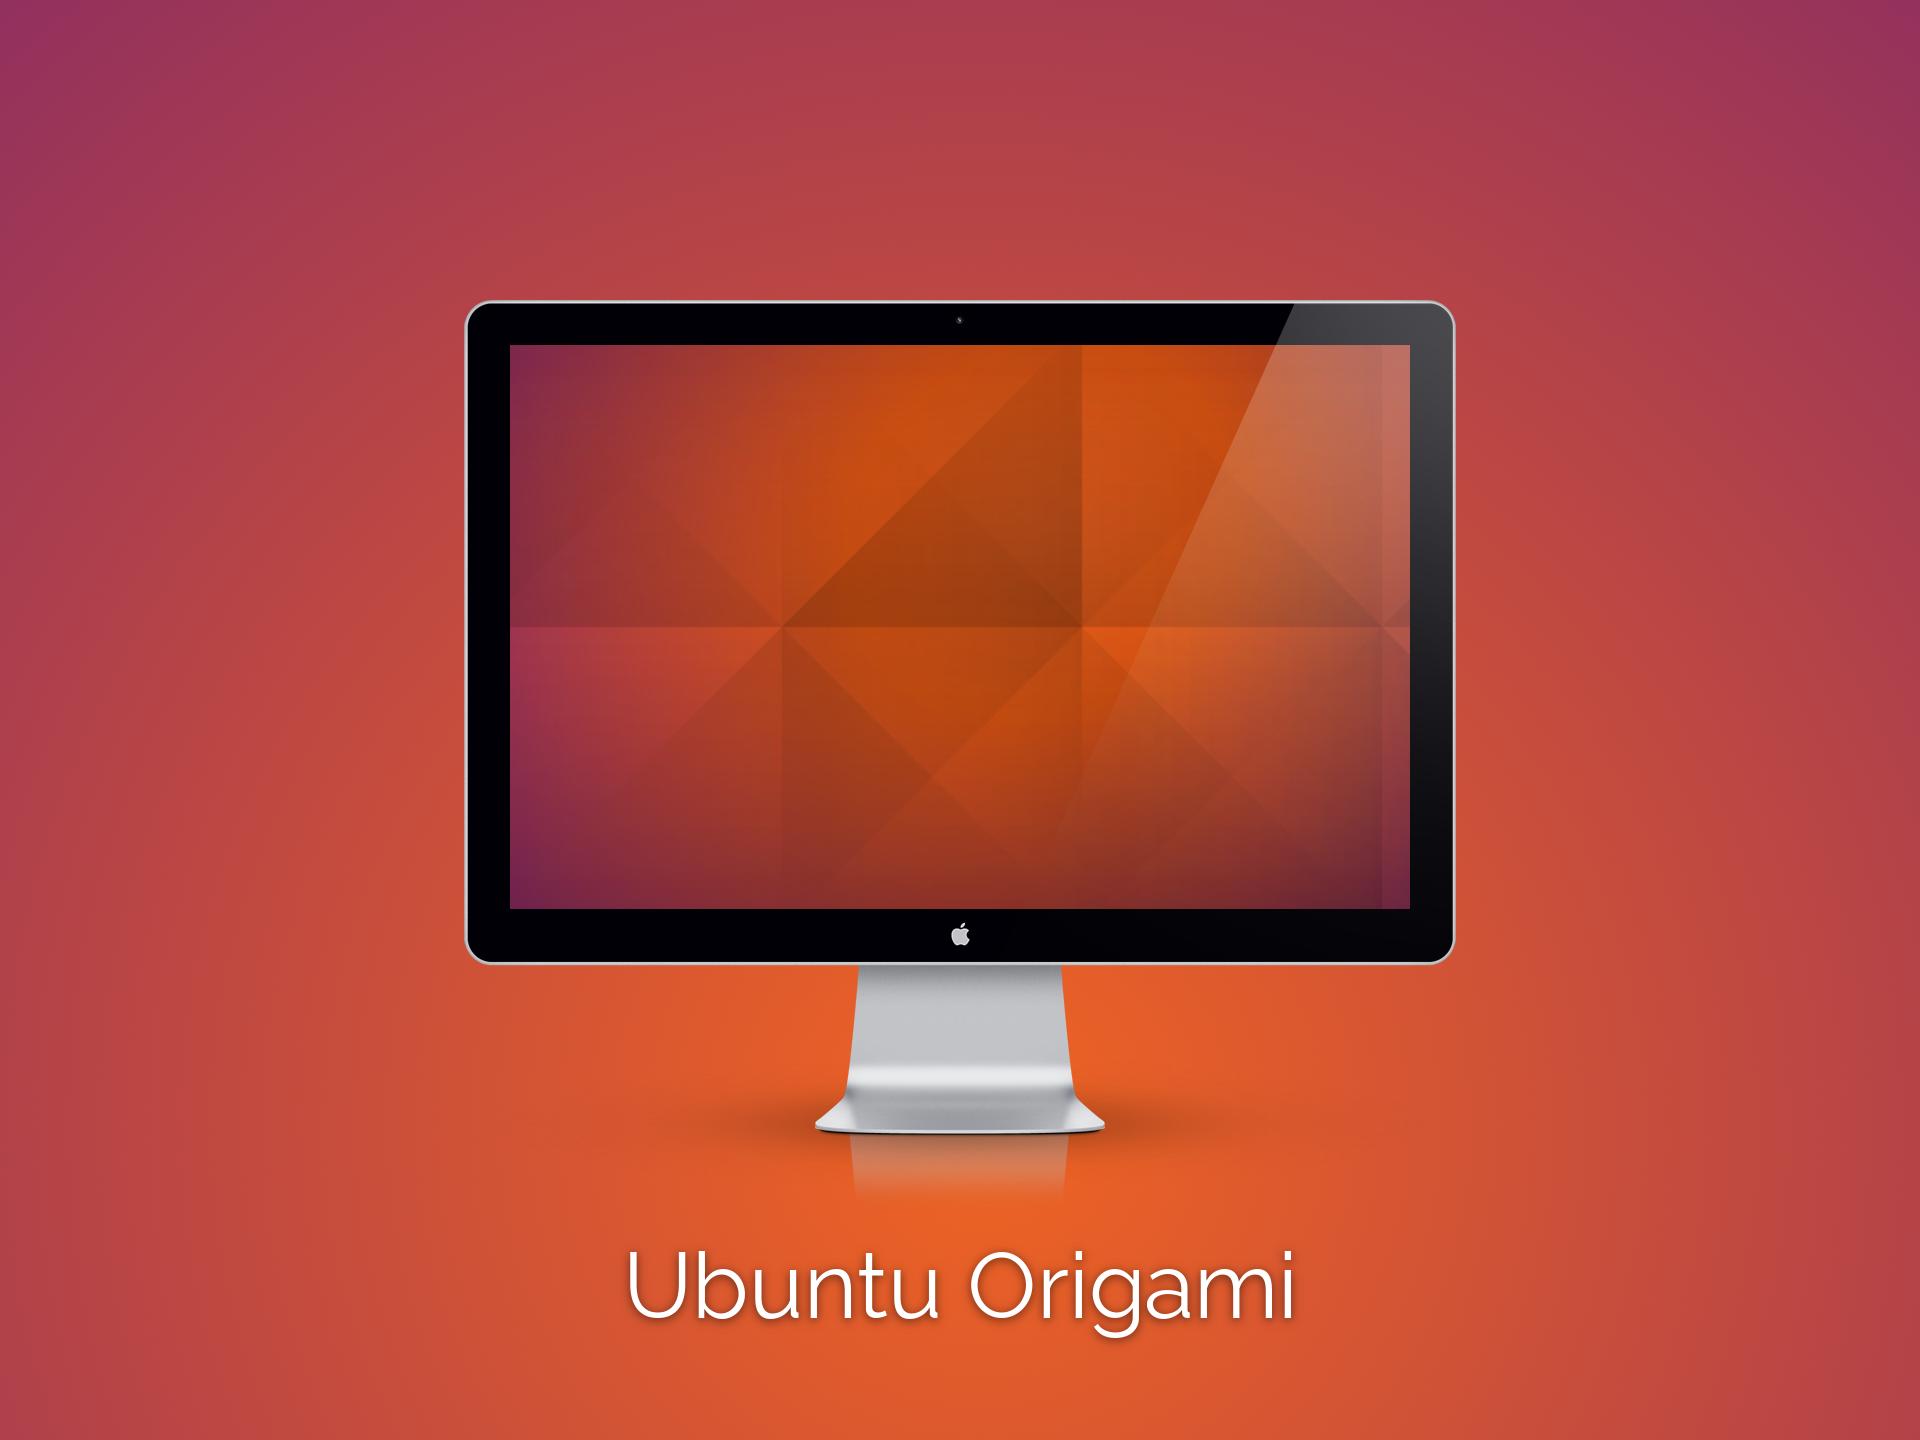 Ubuntu Origami